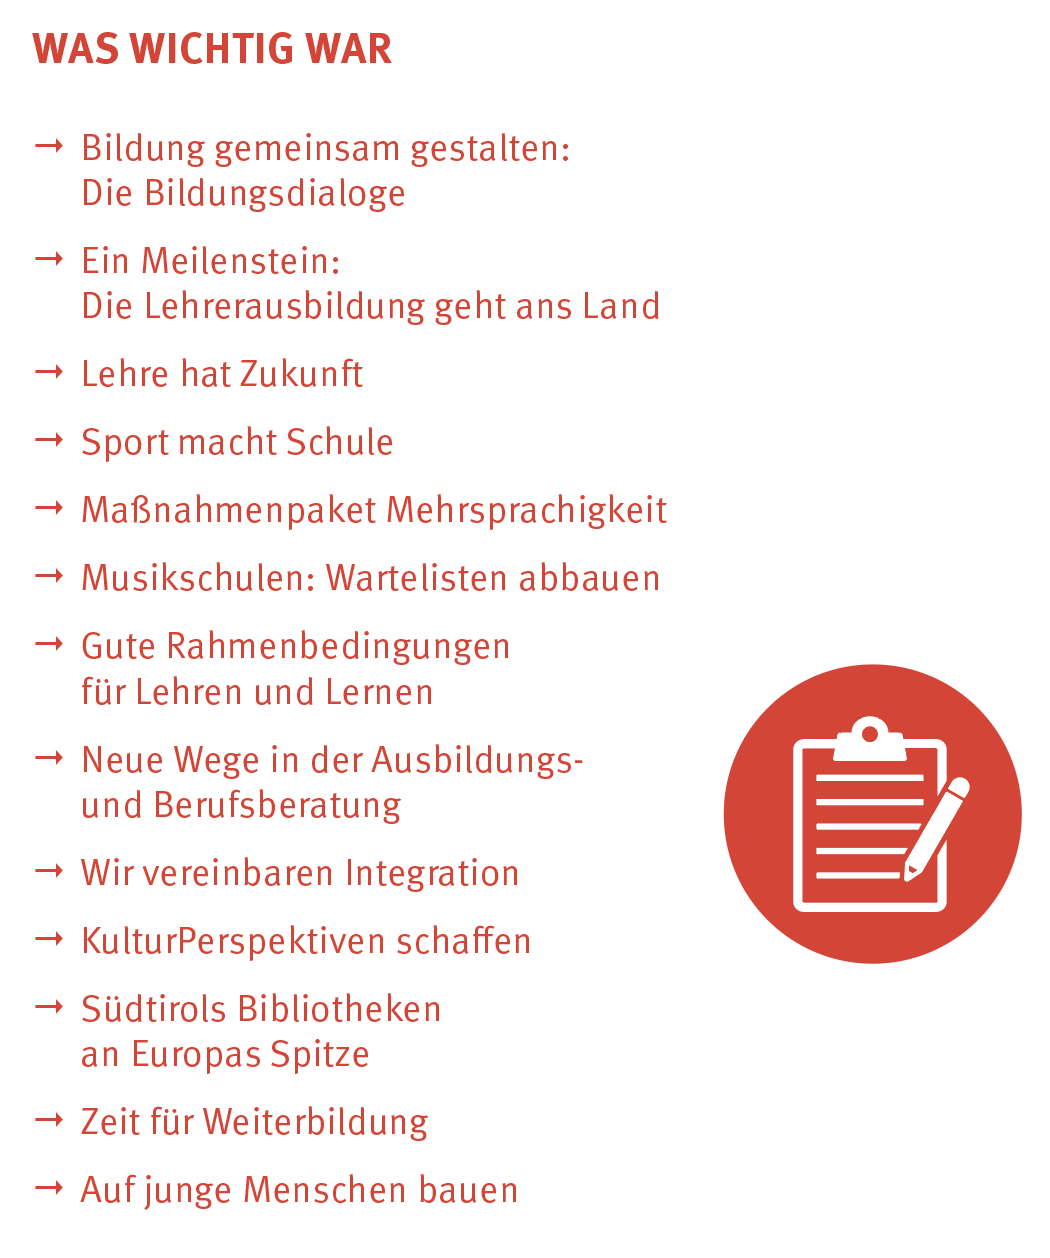 pa_topics_zukunvt.png